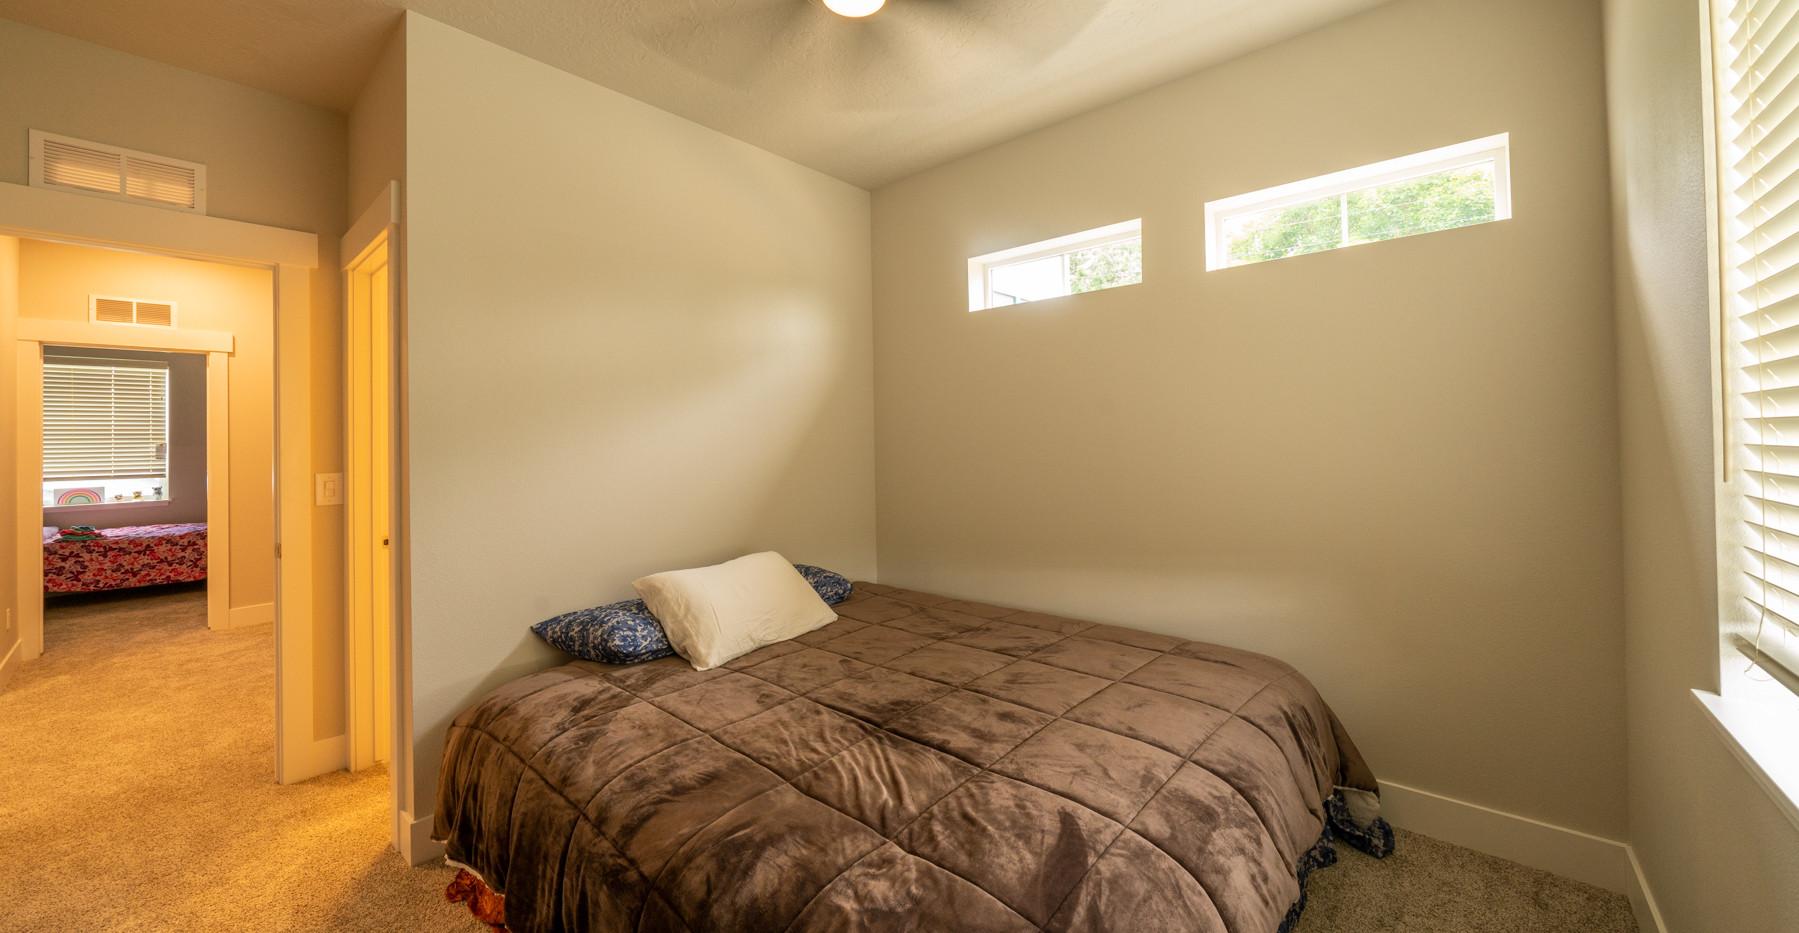 Multifamily Housing Interior 3